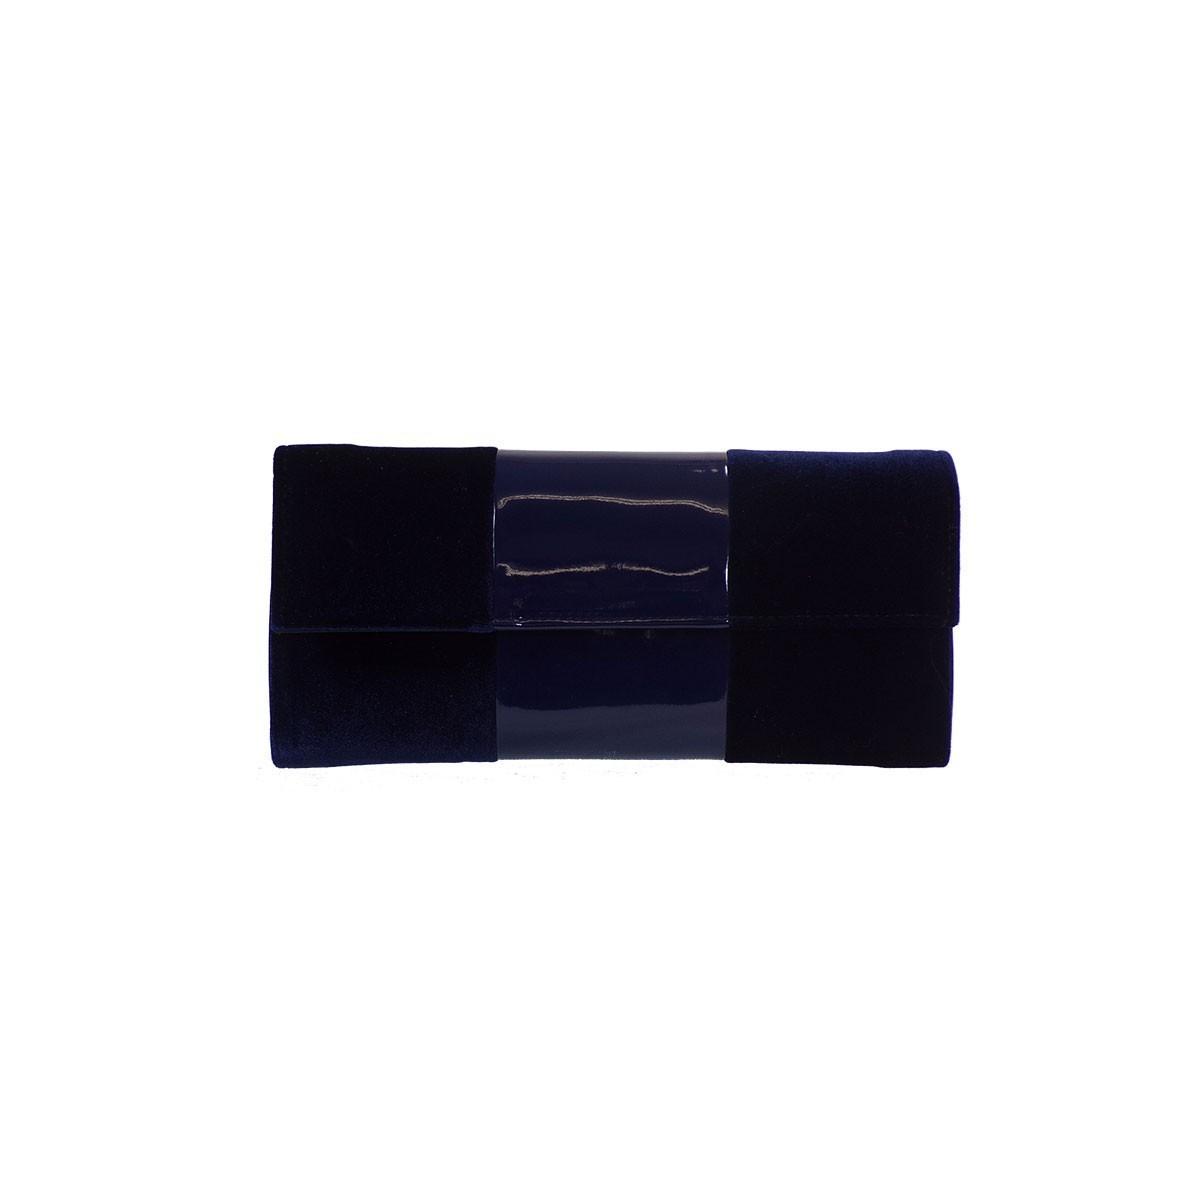 De Raggi Γυναικείες Τσάντες – Φάκελος 7501 Μπλε Βελούδο